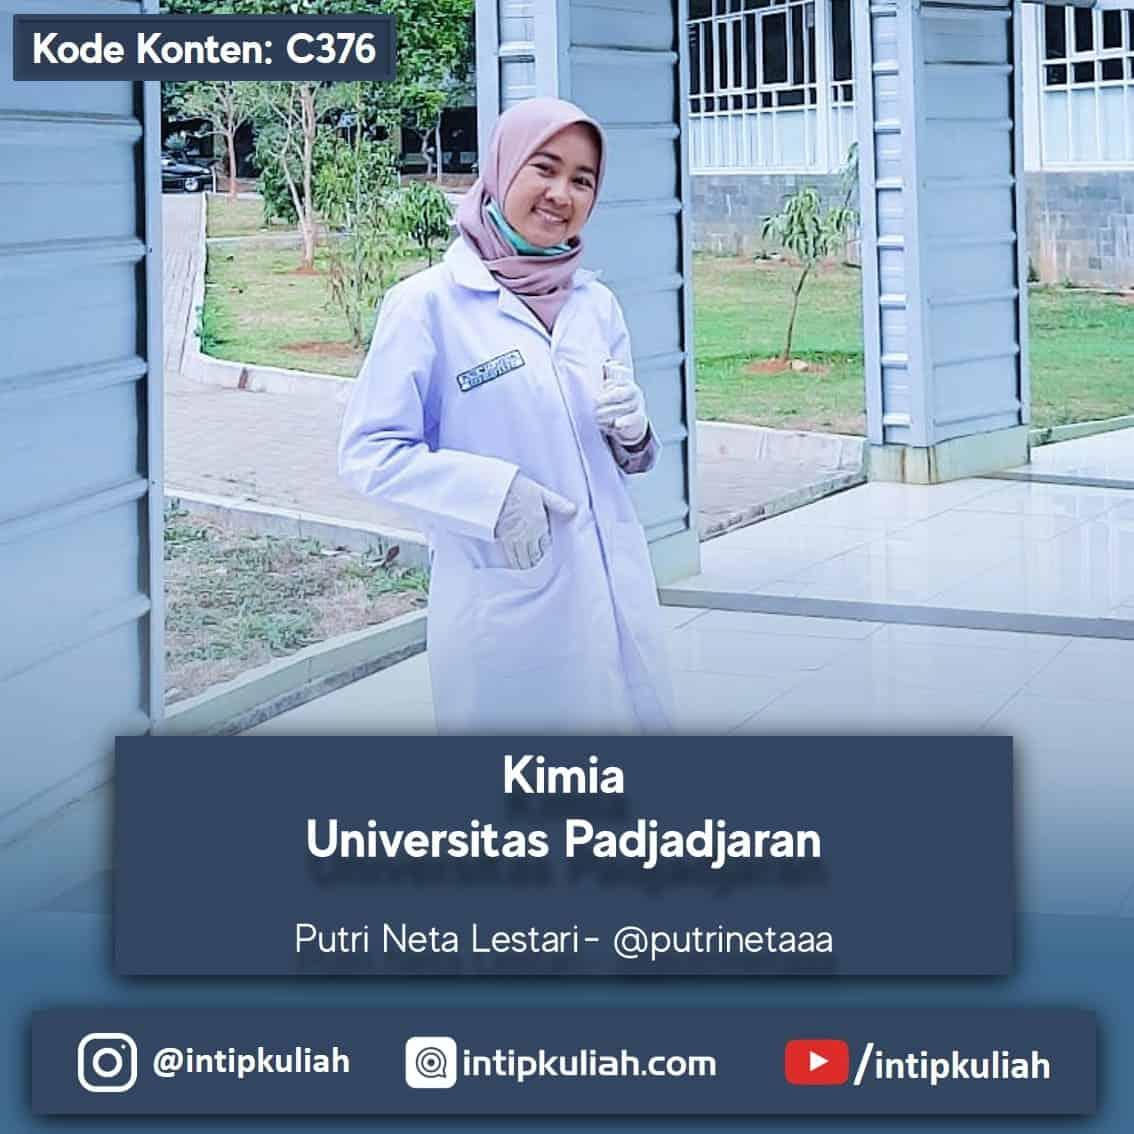 Kimia Universitas Padjadjaran (Putri)